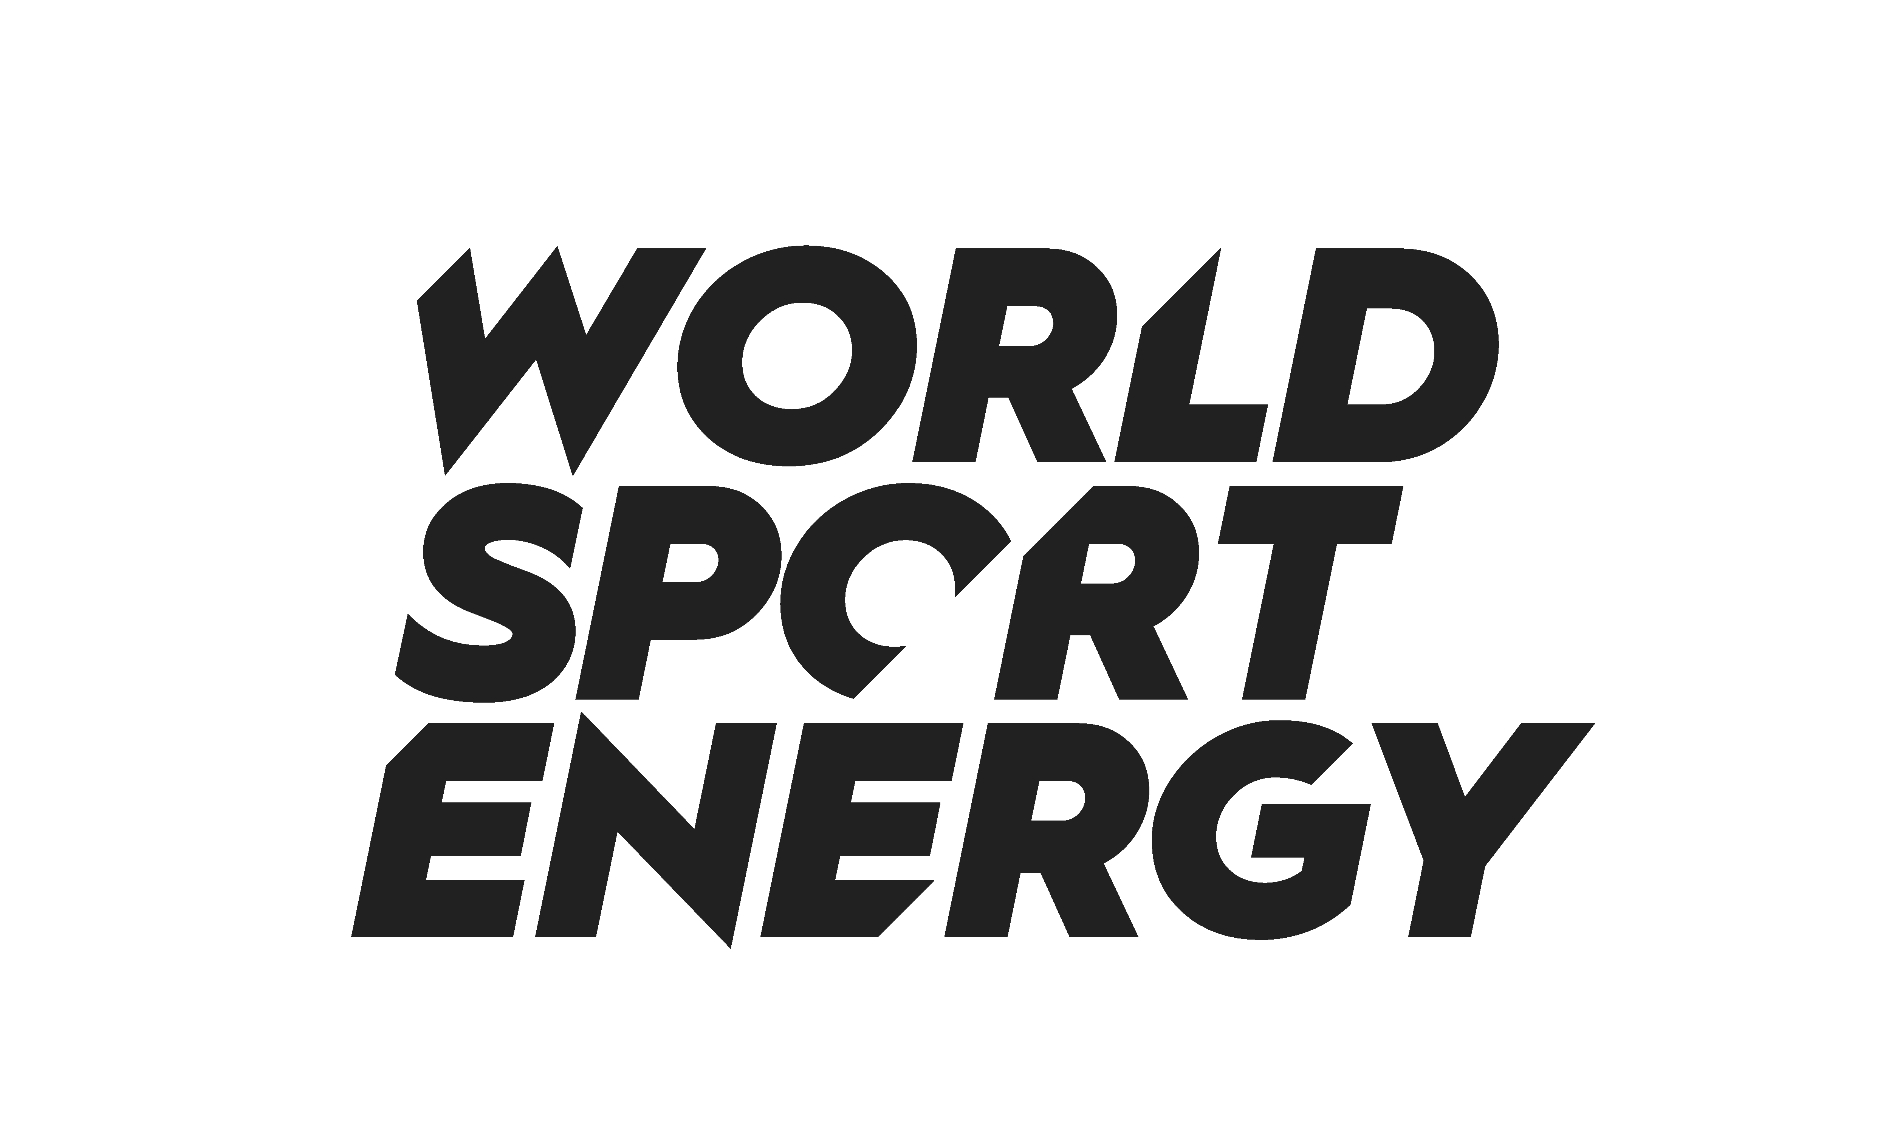 WORLD SPORT ENERGY